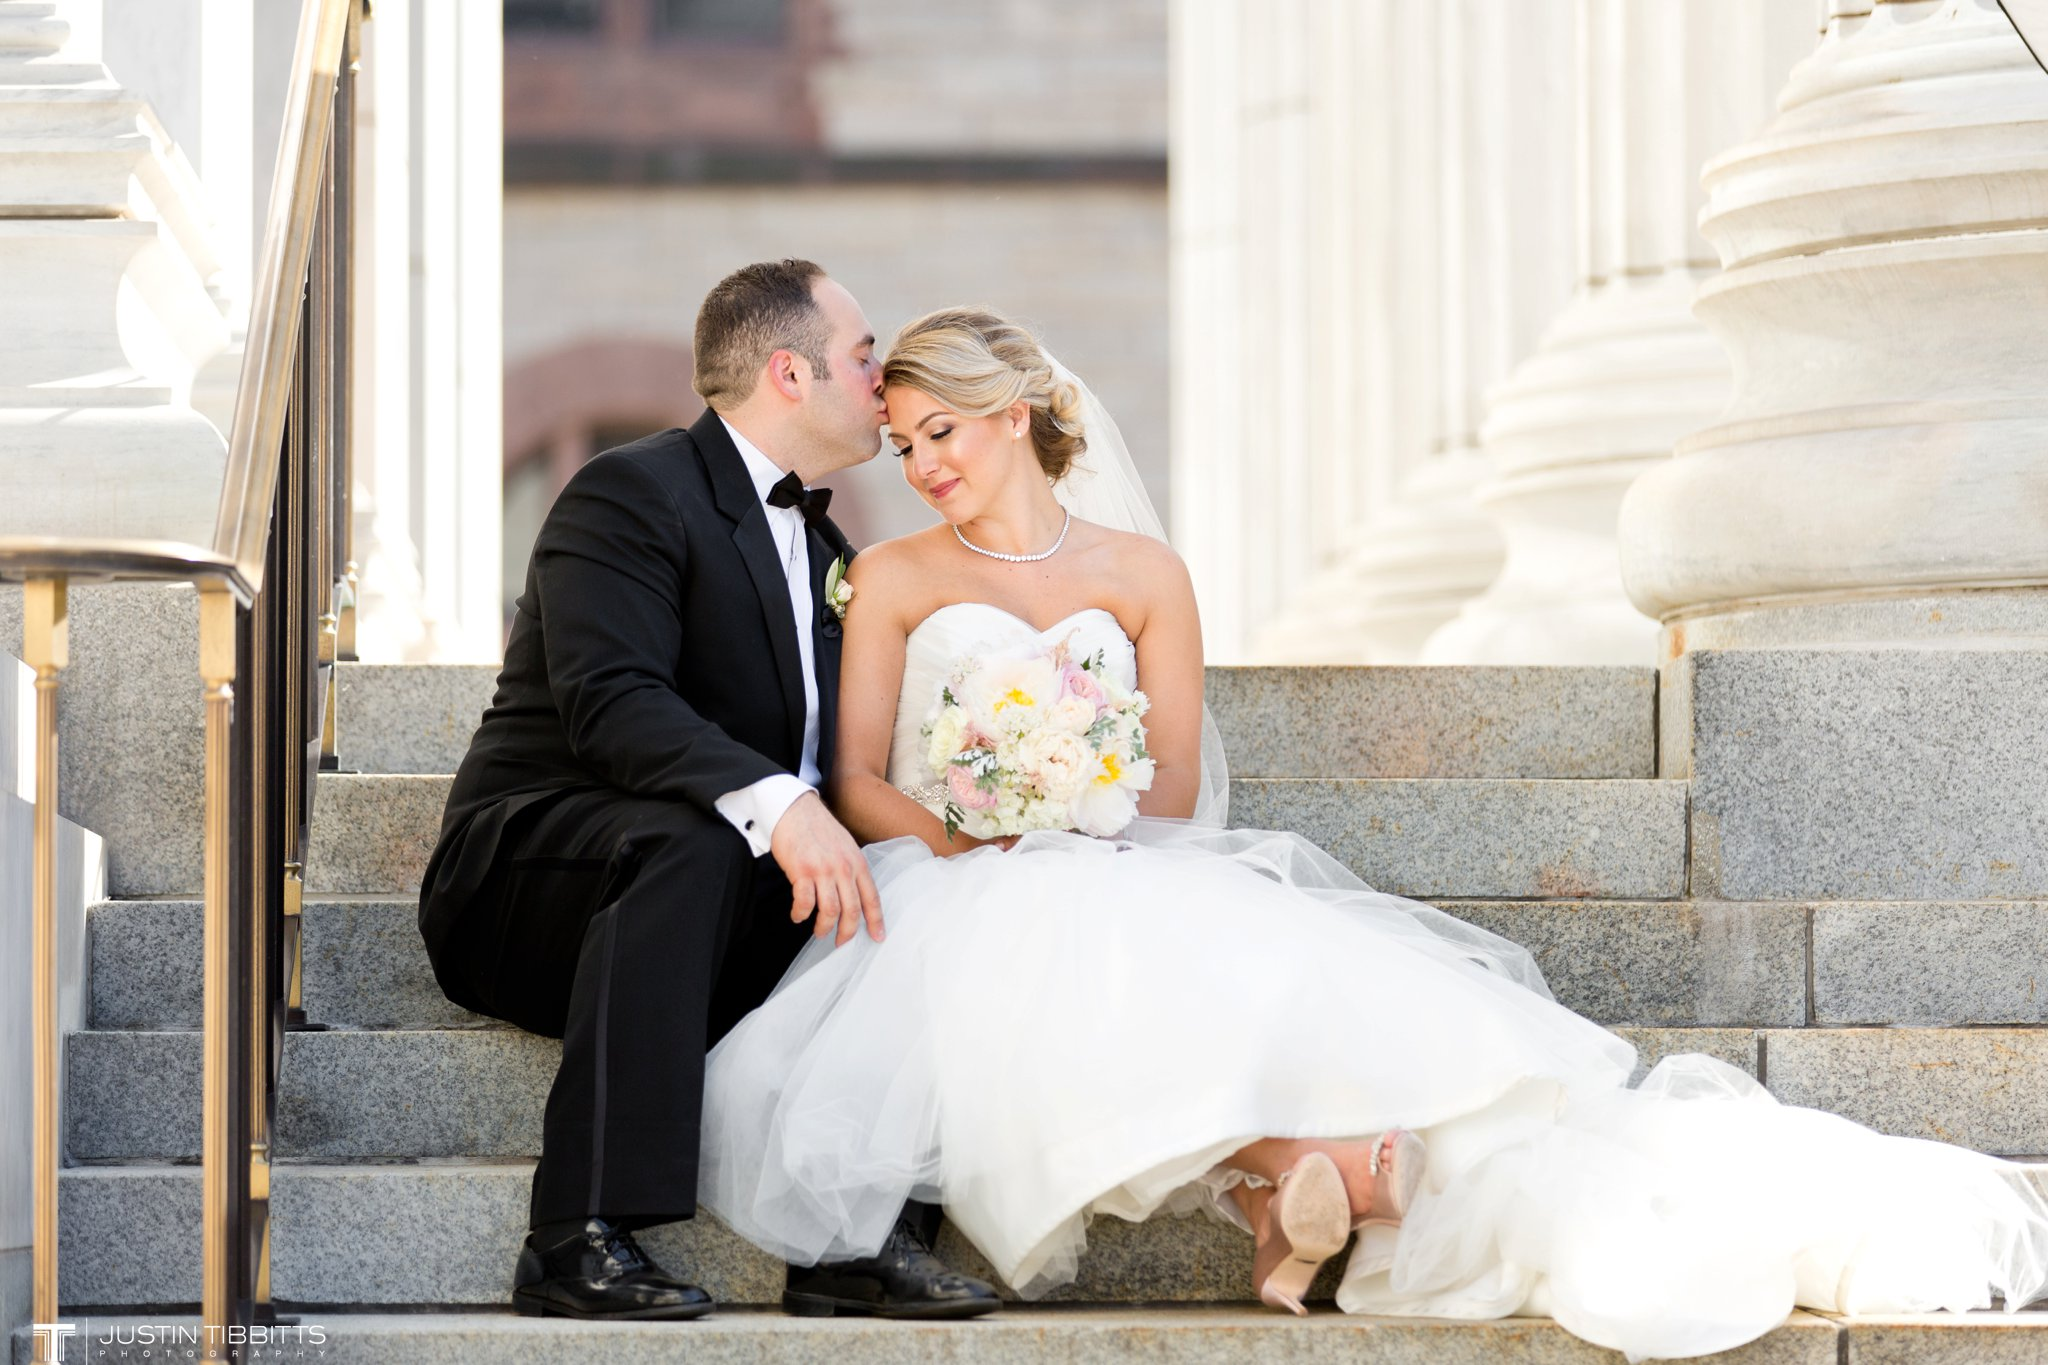 state-room-wedding-photos-with-amanda-and-nick_0121